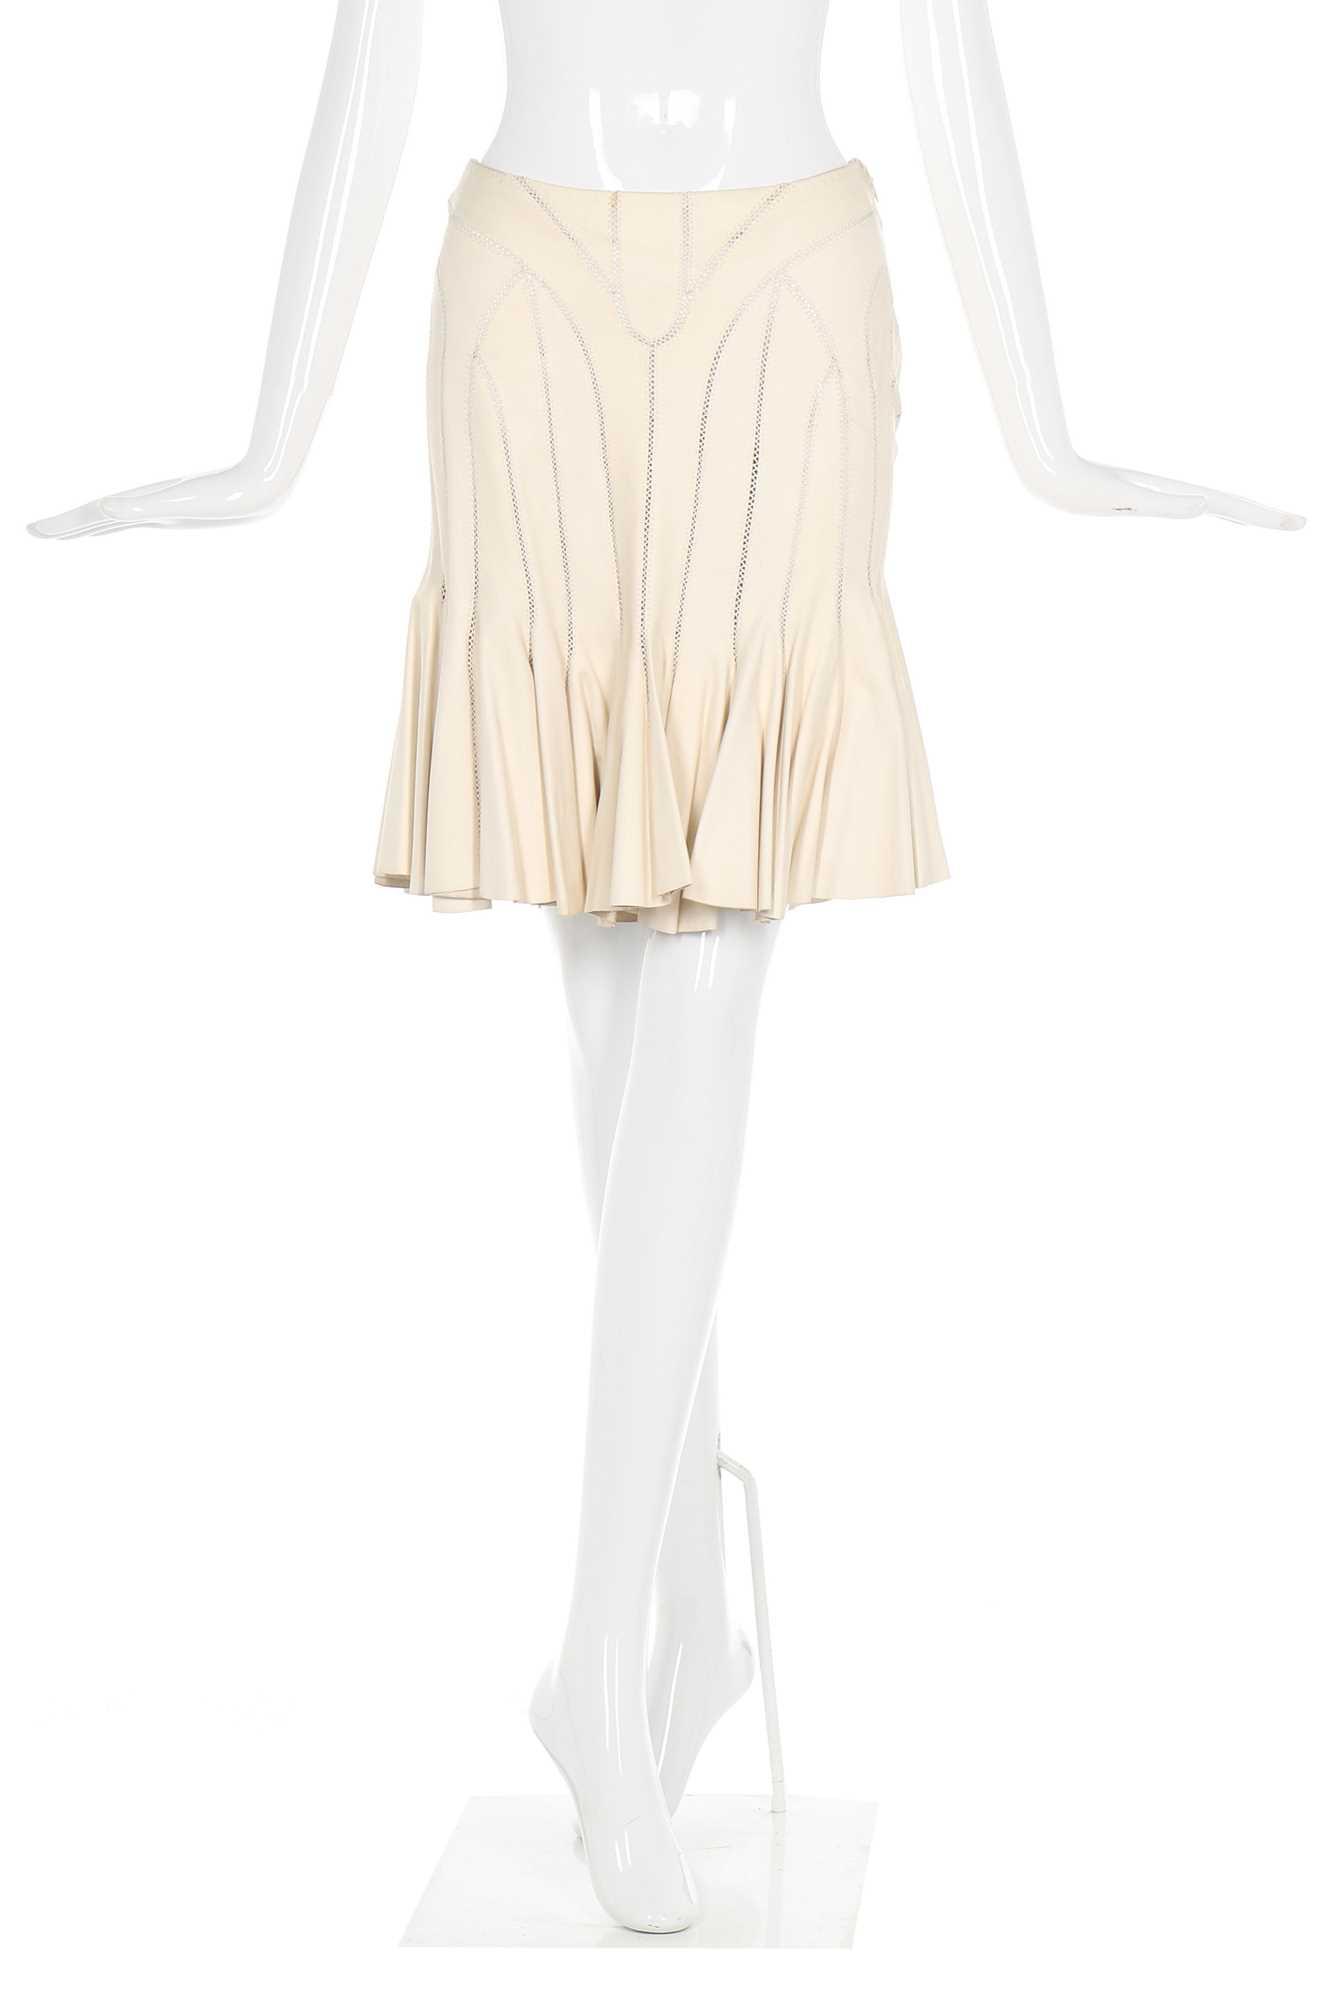 Lot 32-Alexander McQueen panelled leather skirt, 'Deliverance', Spring-Summer 2004